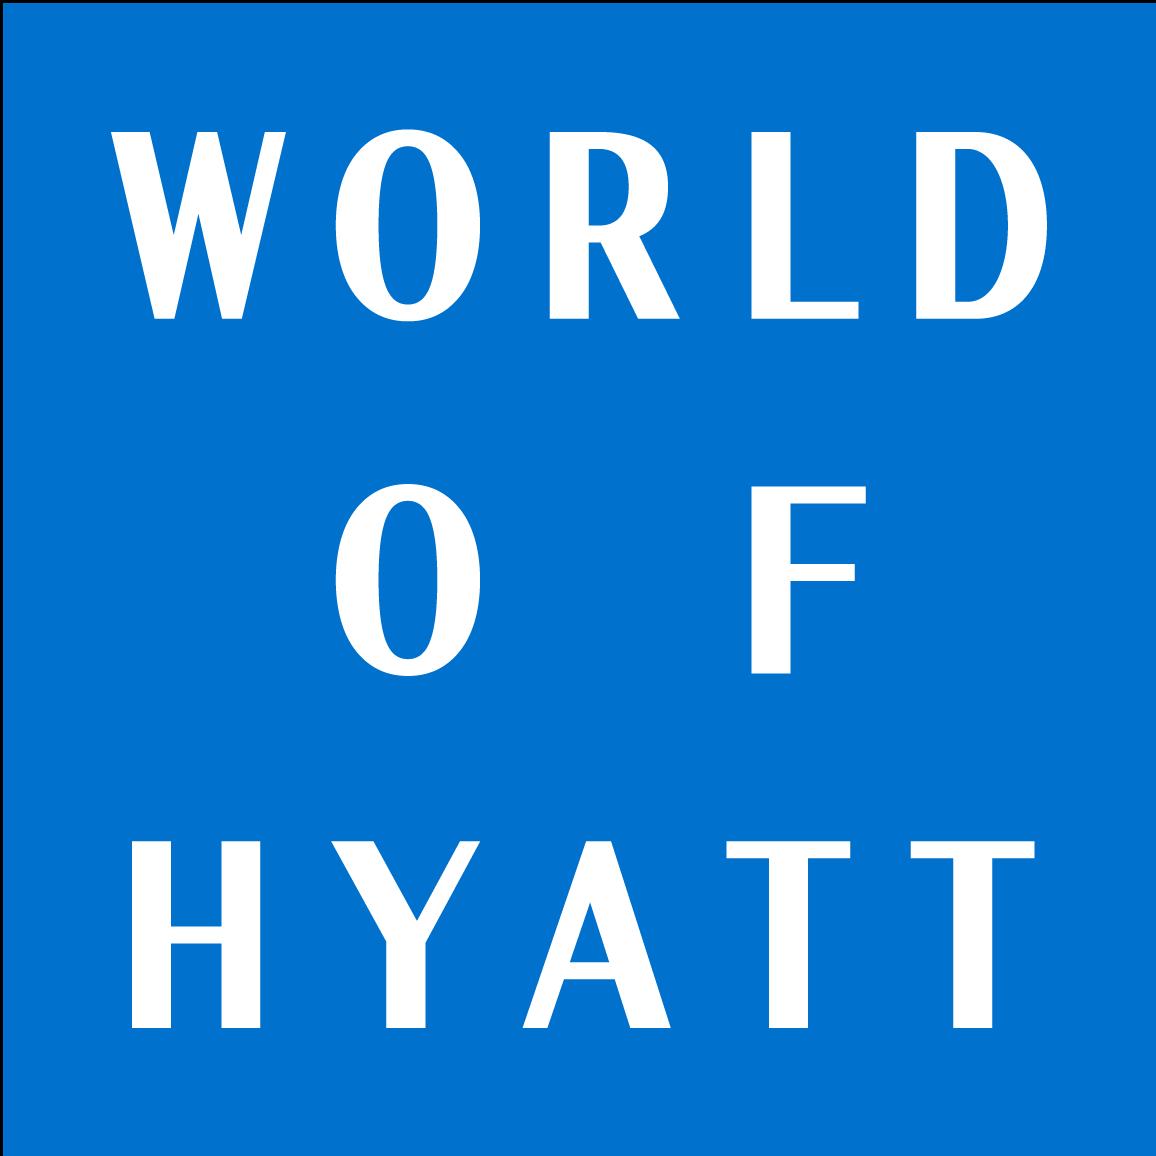 World of Hyatt Logo | Photo Credit: Hyatt